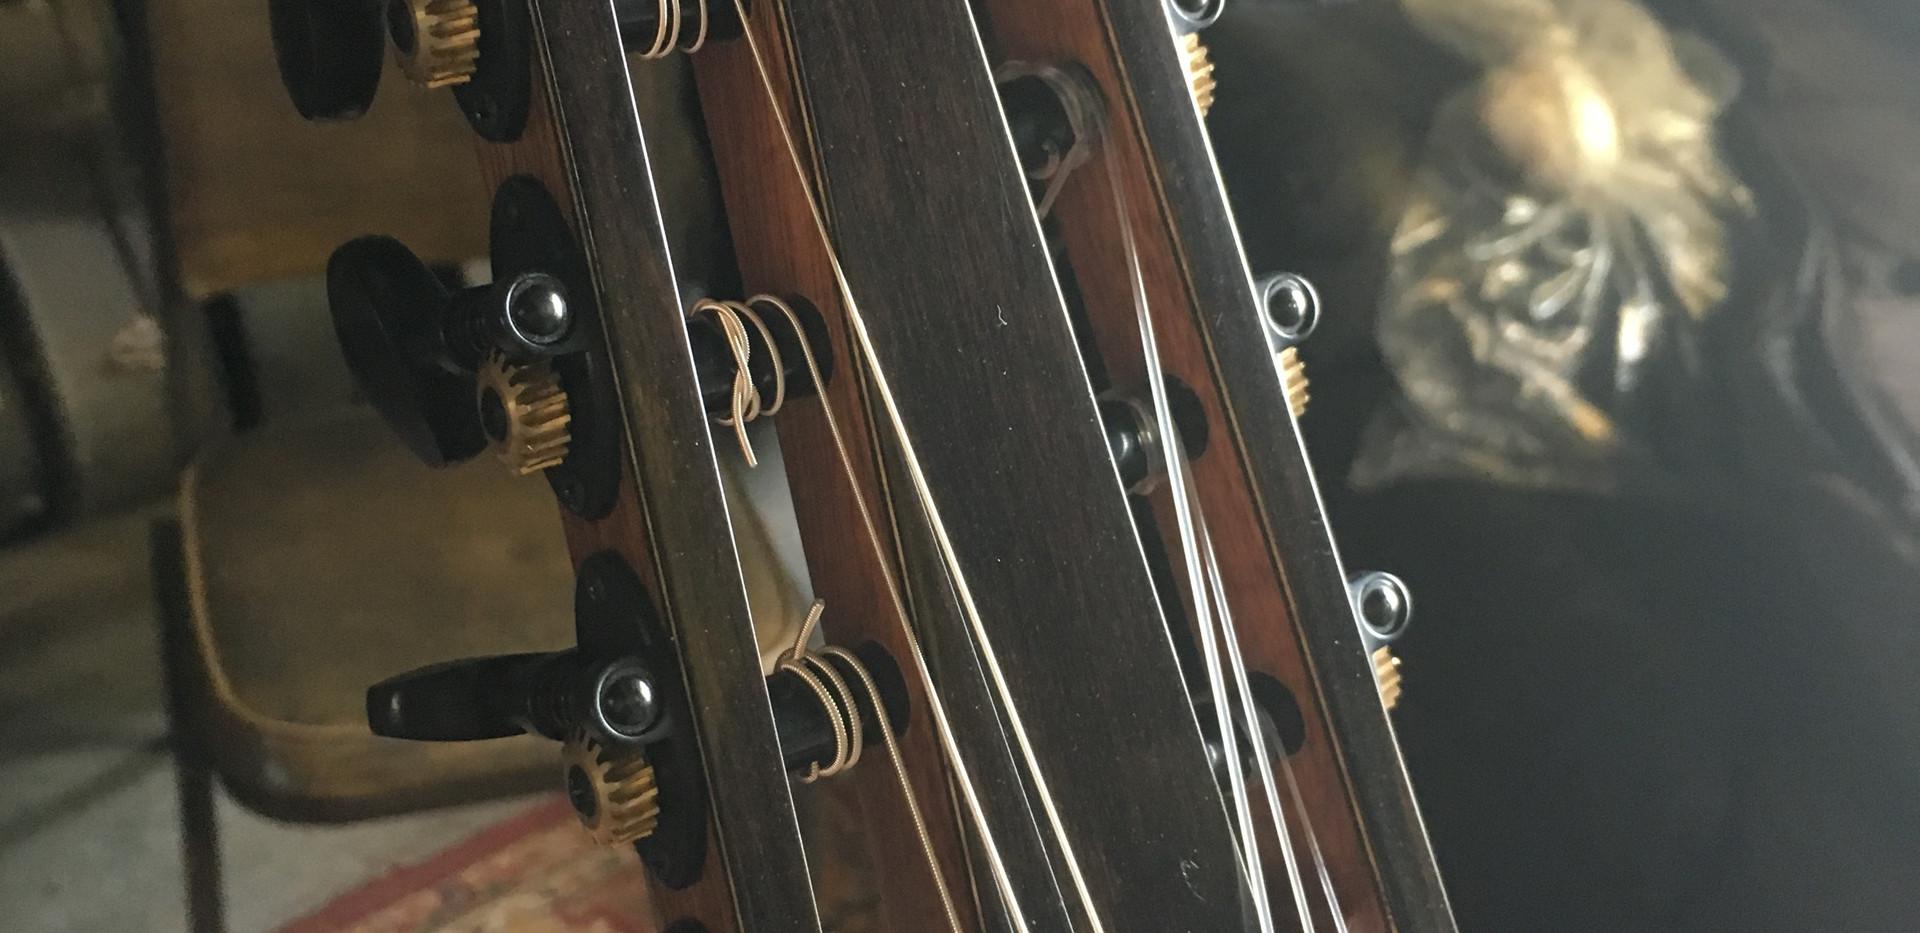 New 2019 GVR Classical 7 String Precious Woods